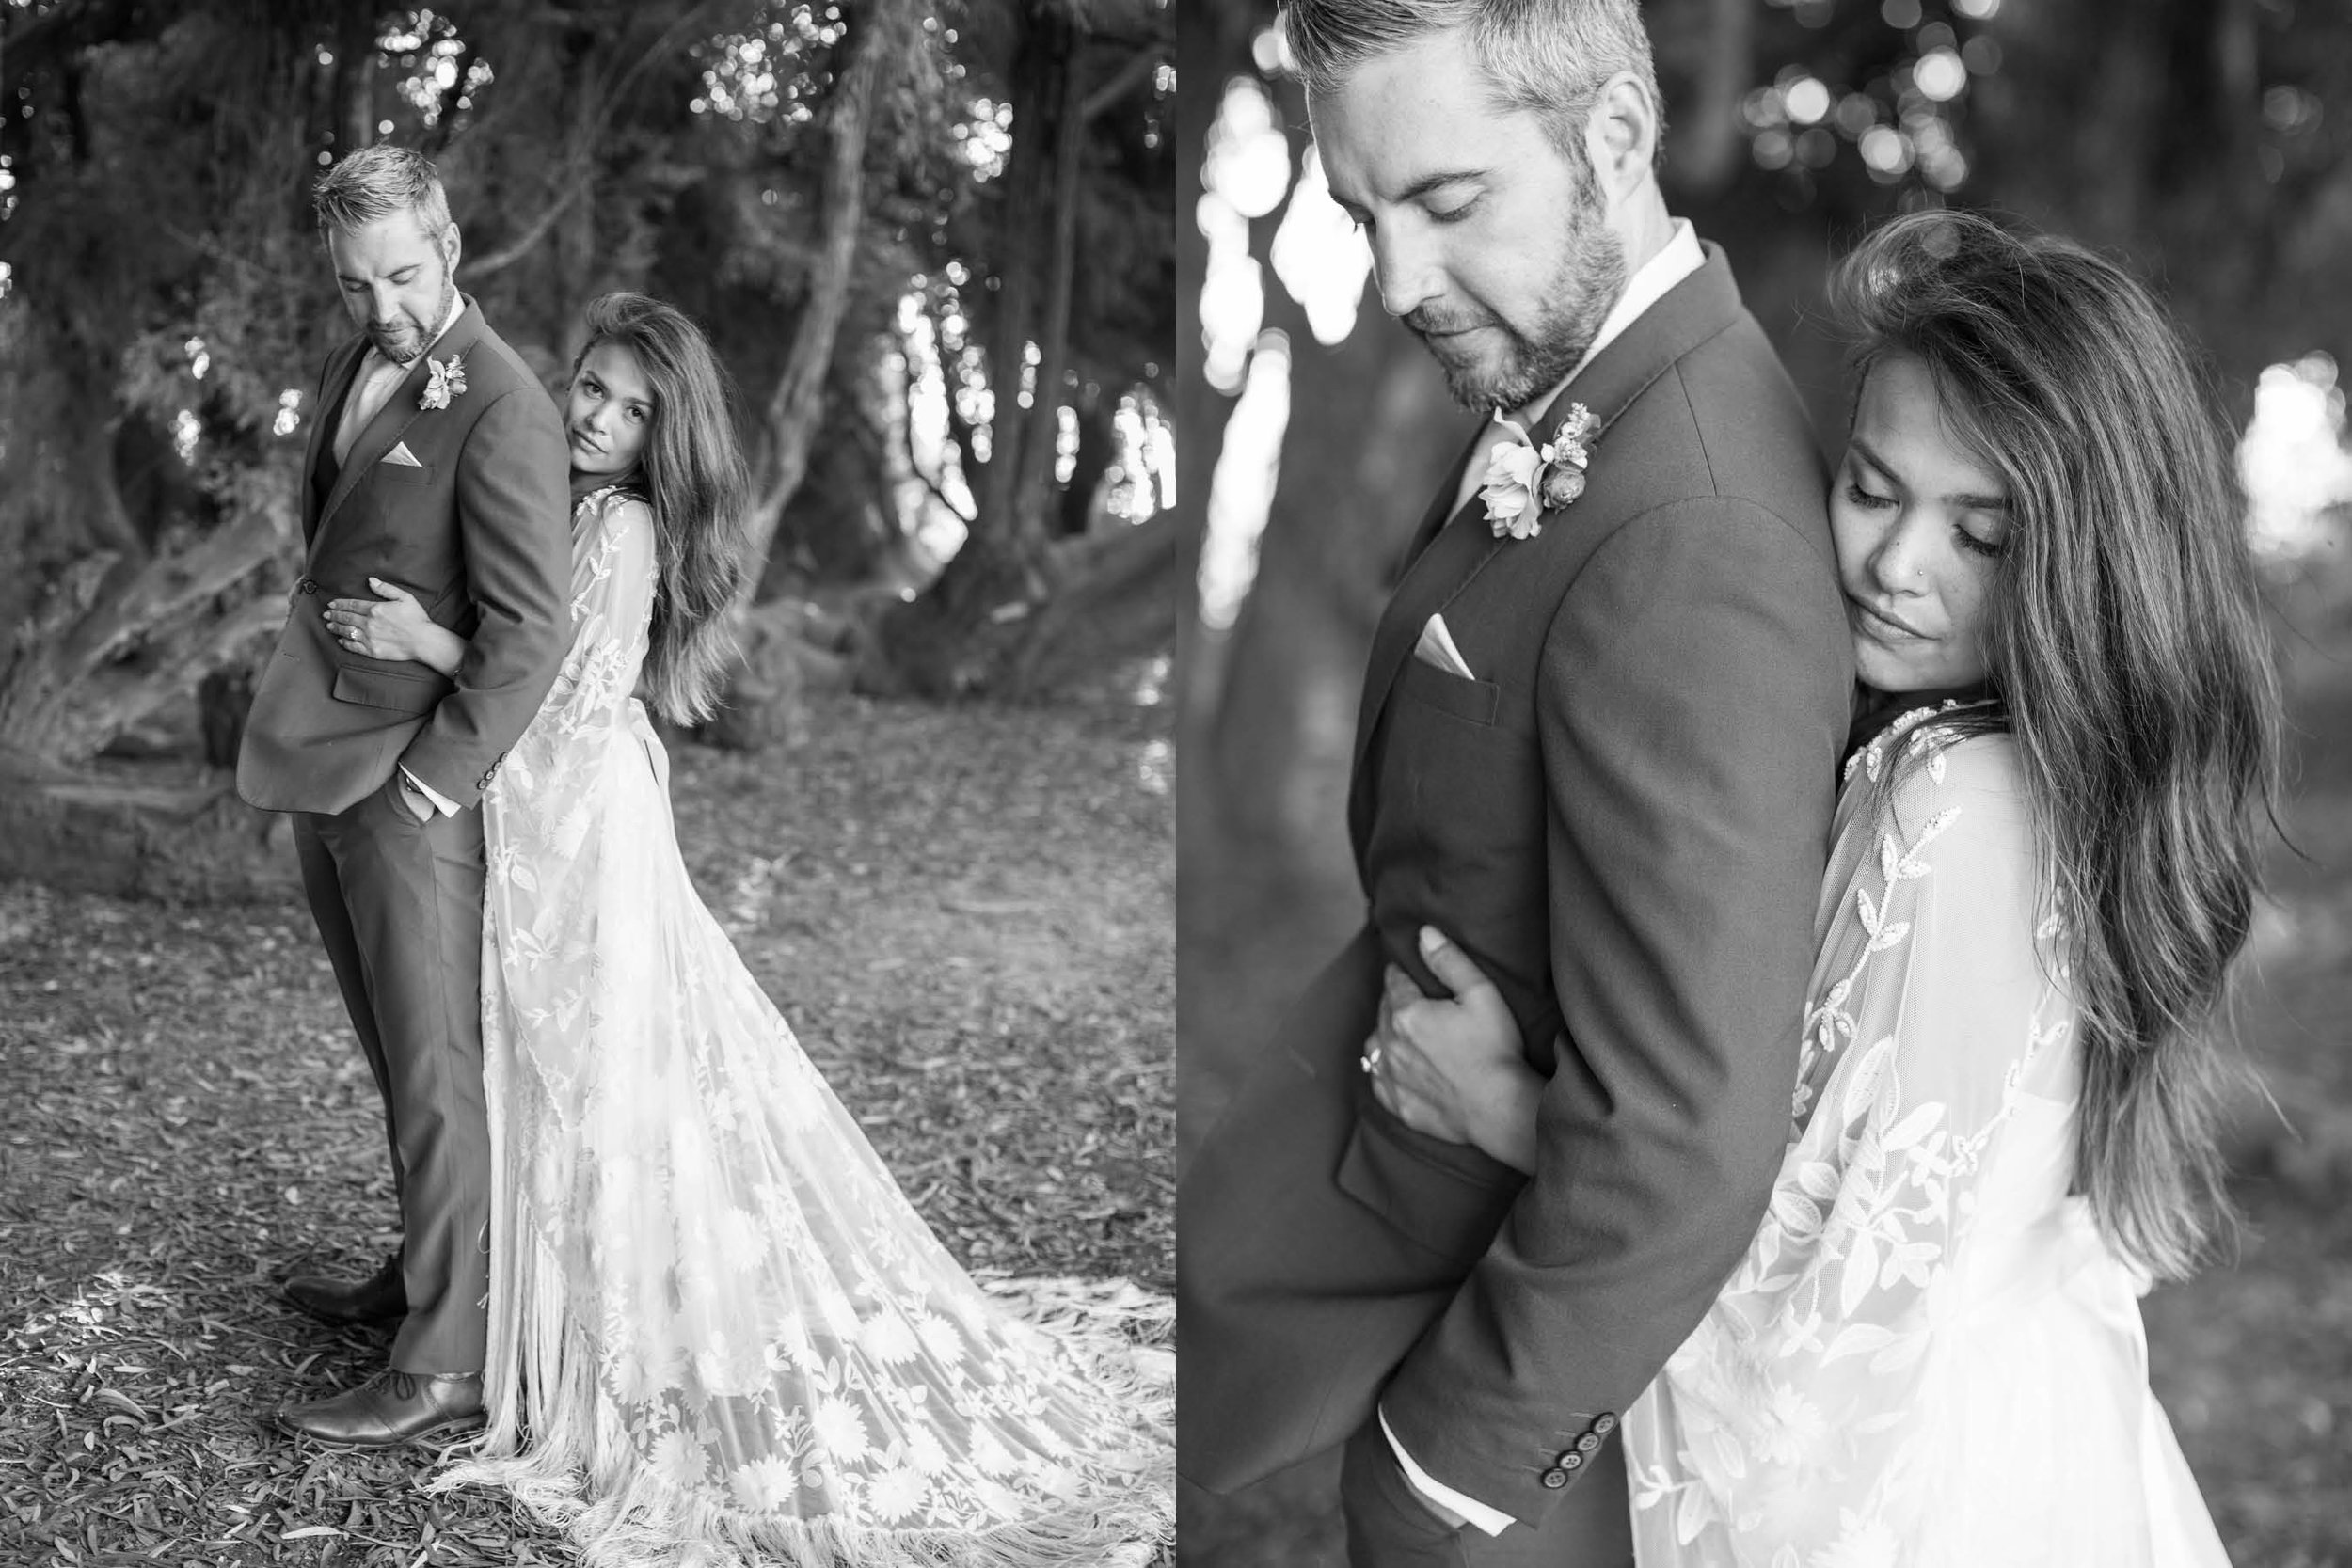 santa-barbara-elopement-elope-wedding-pop-up-coordinator-day-of-event-planning-planner-ellwood-bluff-eucalyptus-grove-rustic-ocean-view-front-hop-green-suit (1 (24).jpg